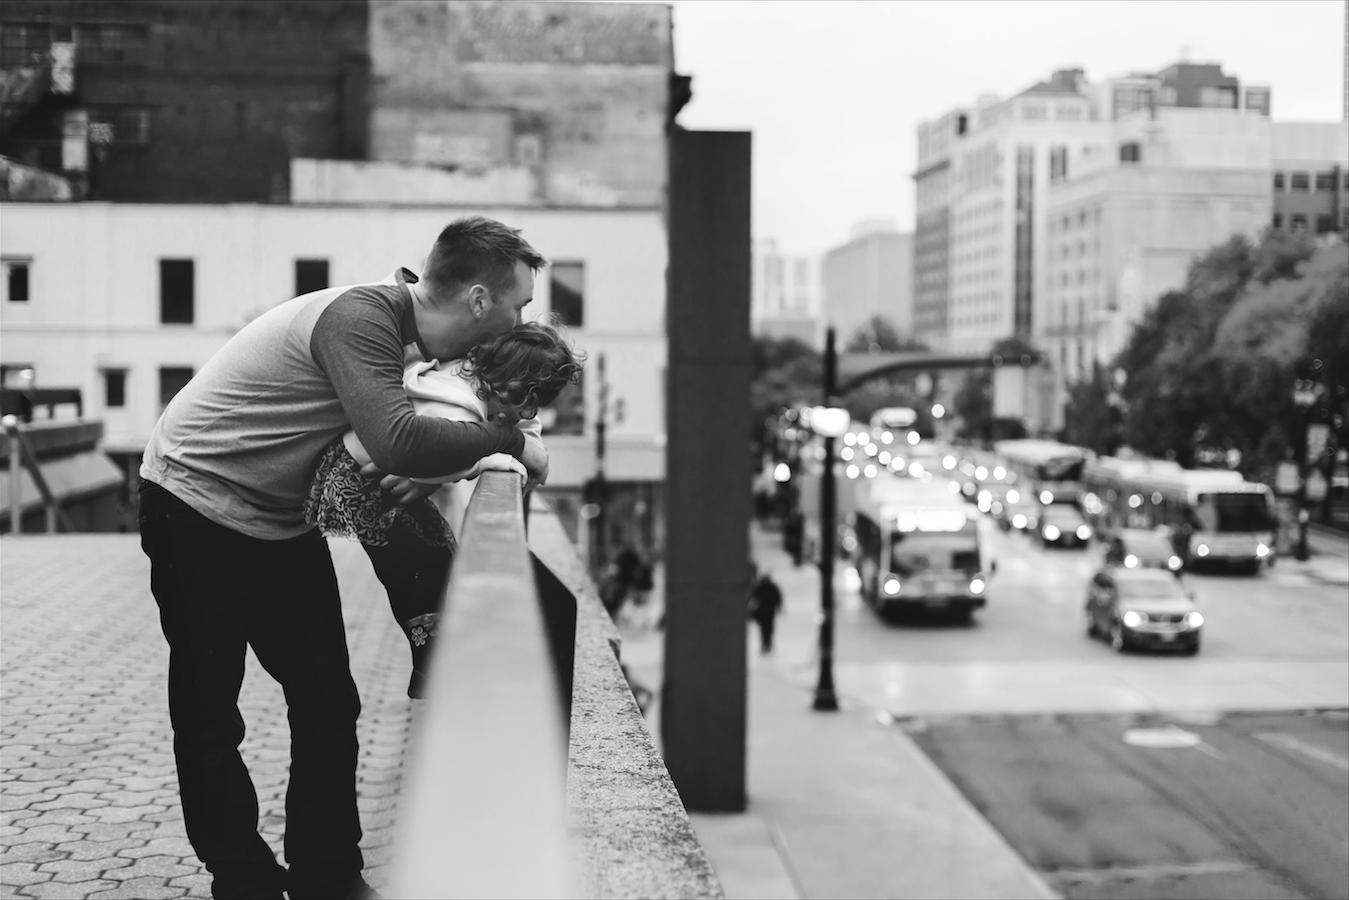 Moments-by-Lauren-Hamilton-Toronto-Niagara-Wedding-Photographer-Genuine-Emotional-Images-Photo-7.png